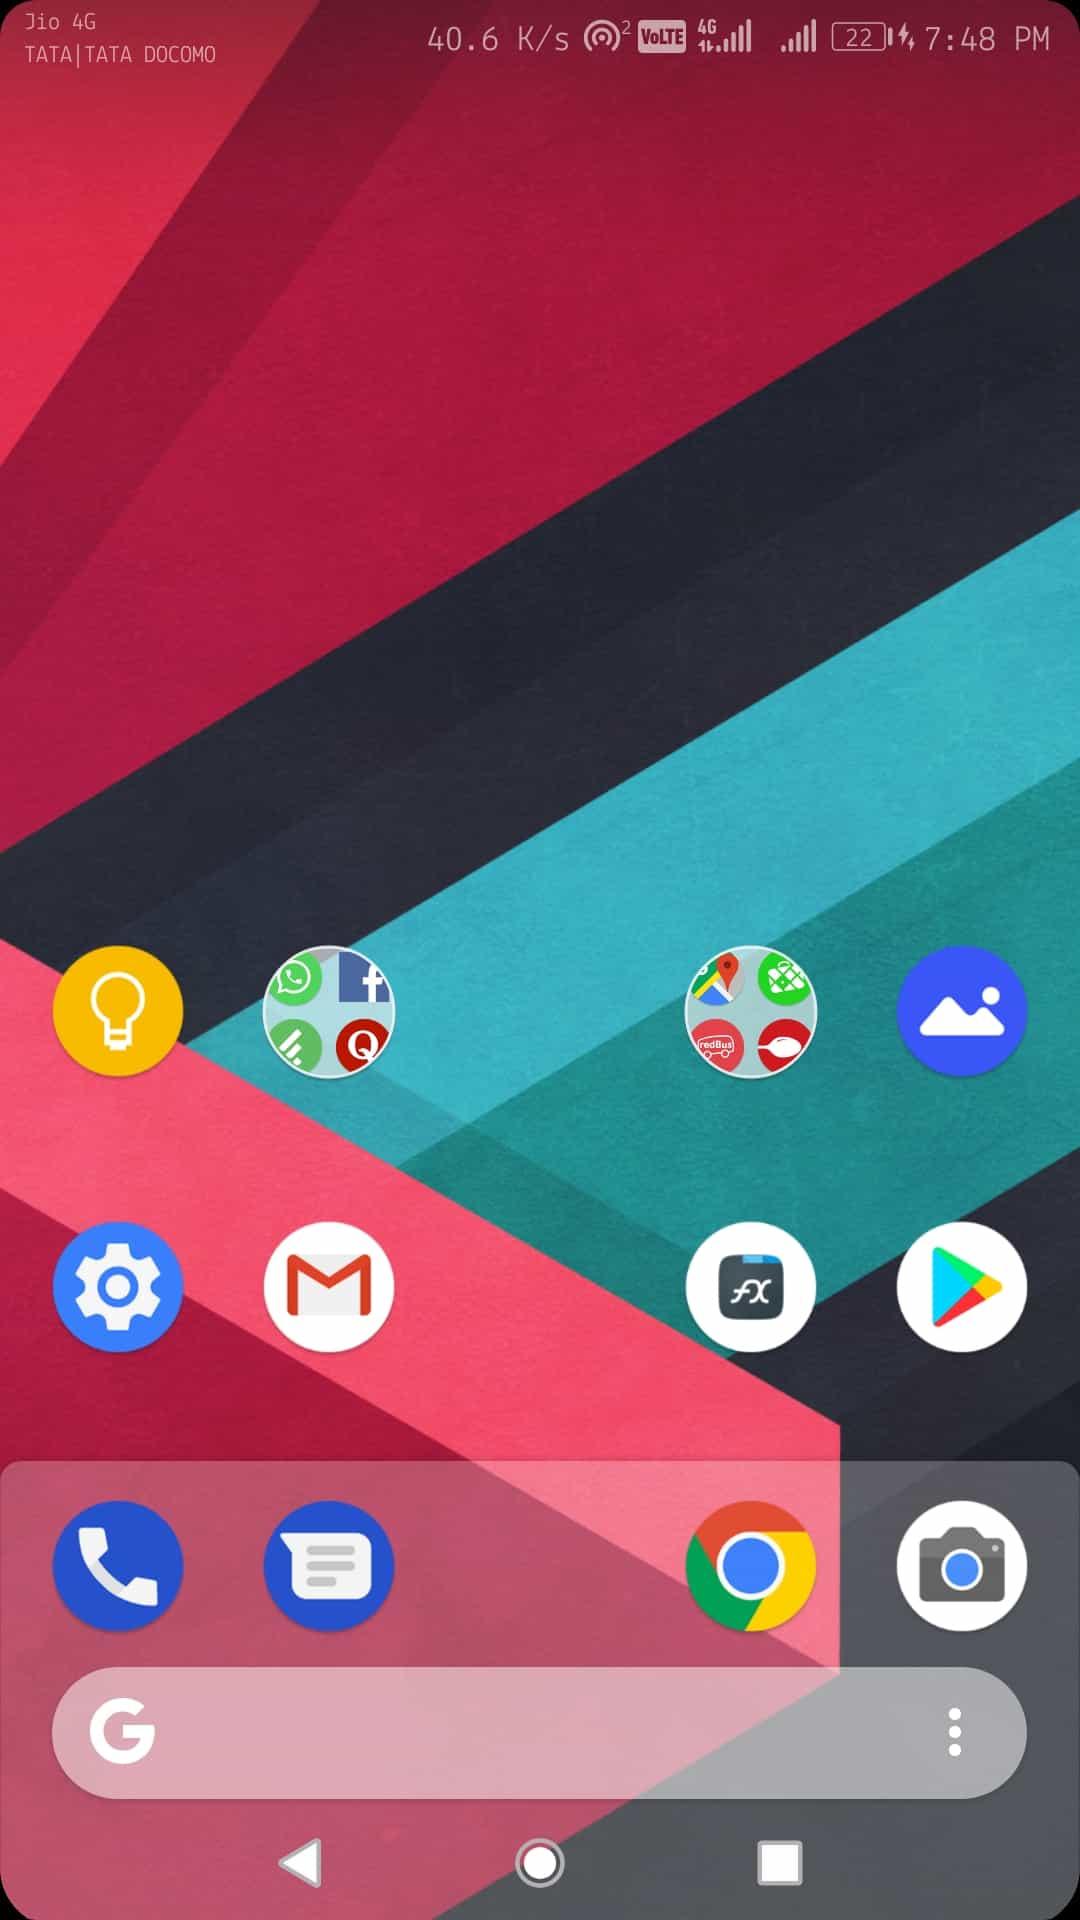 How to make a MIUIXOSEMUI phone look like stock android